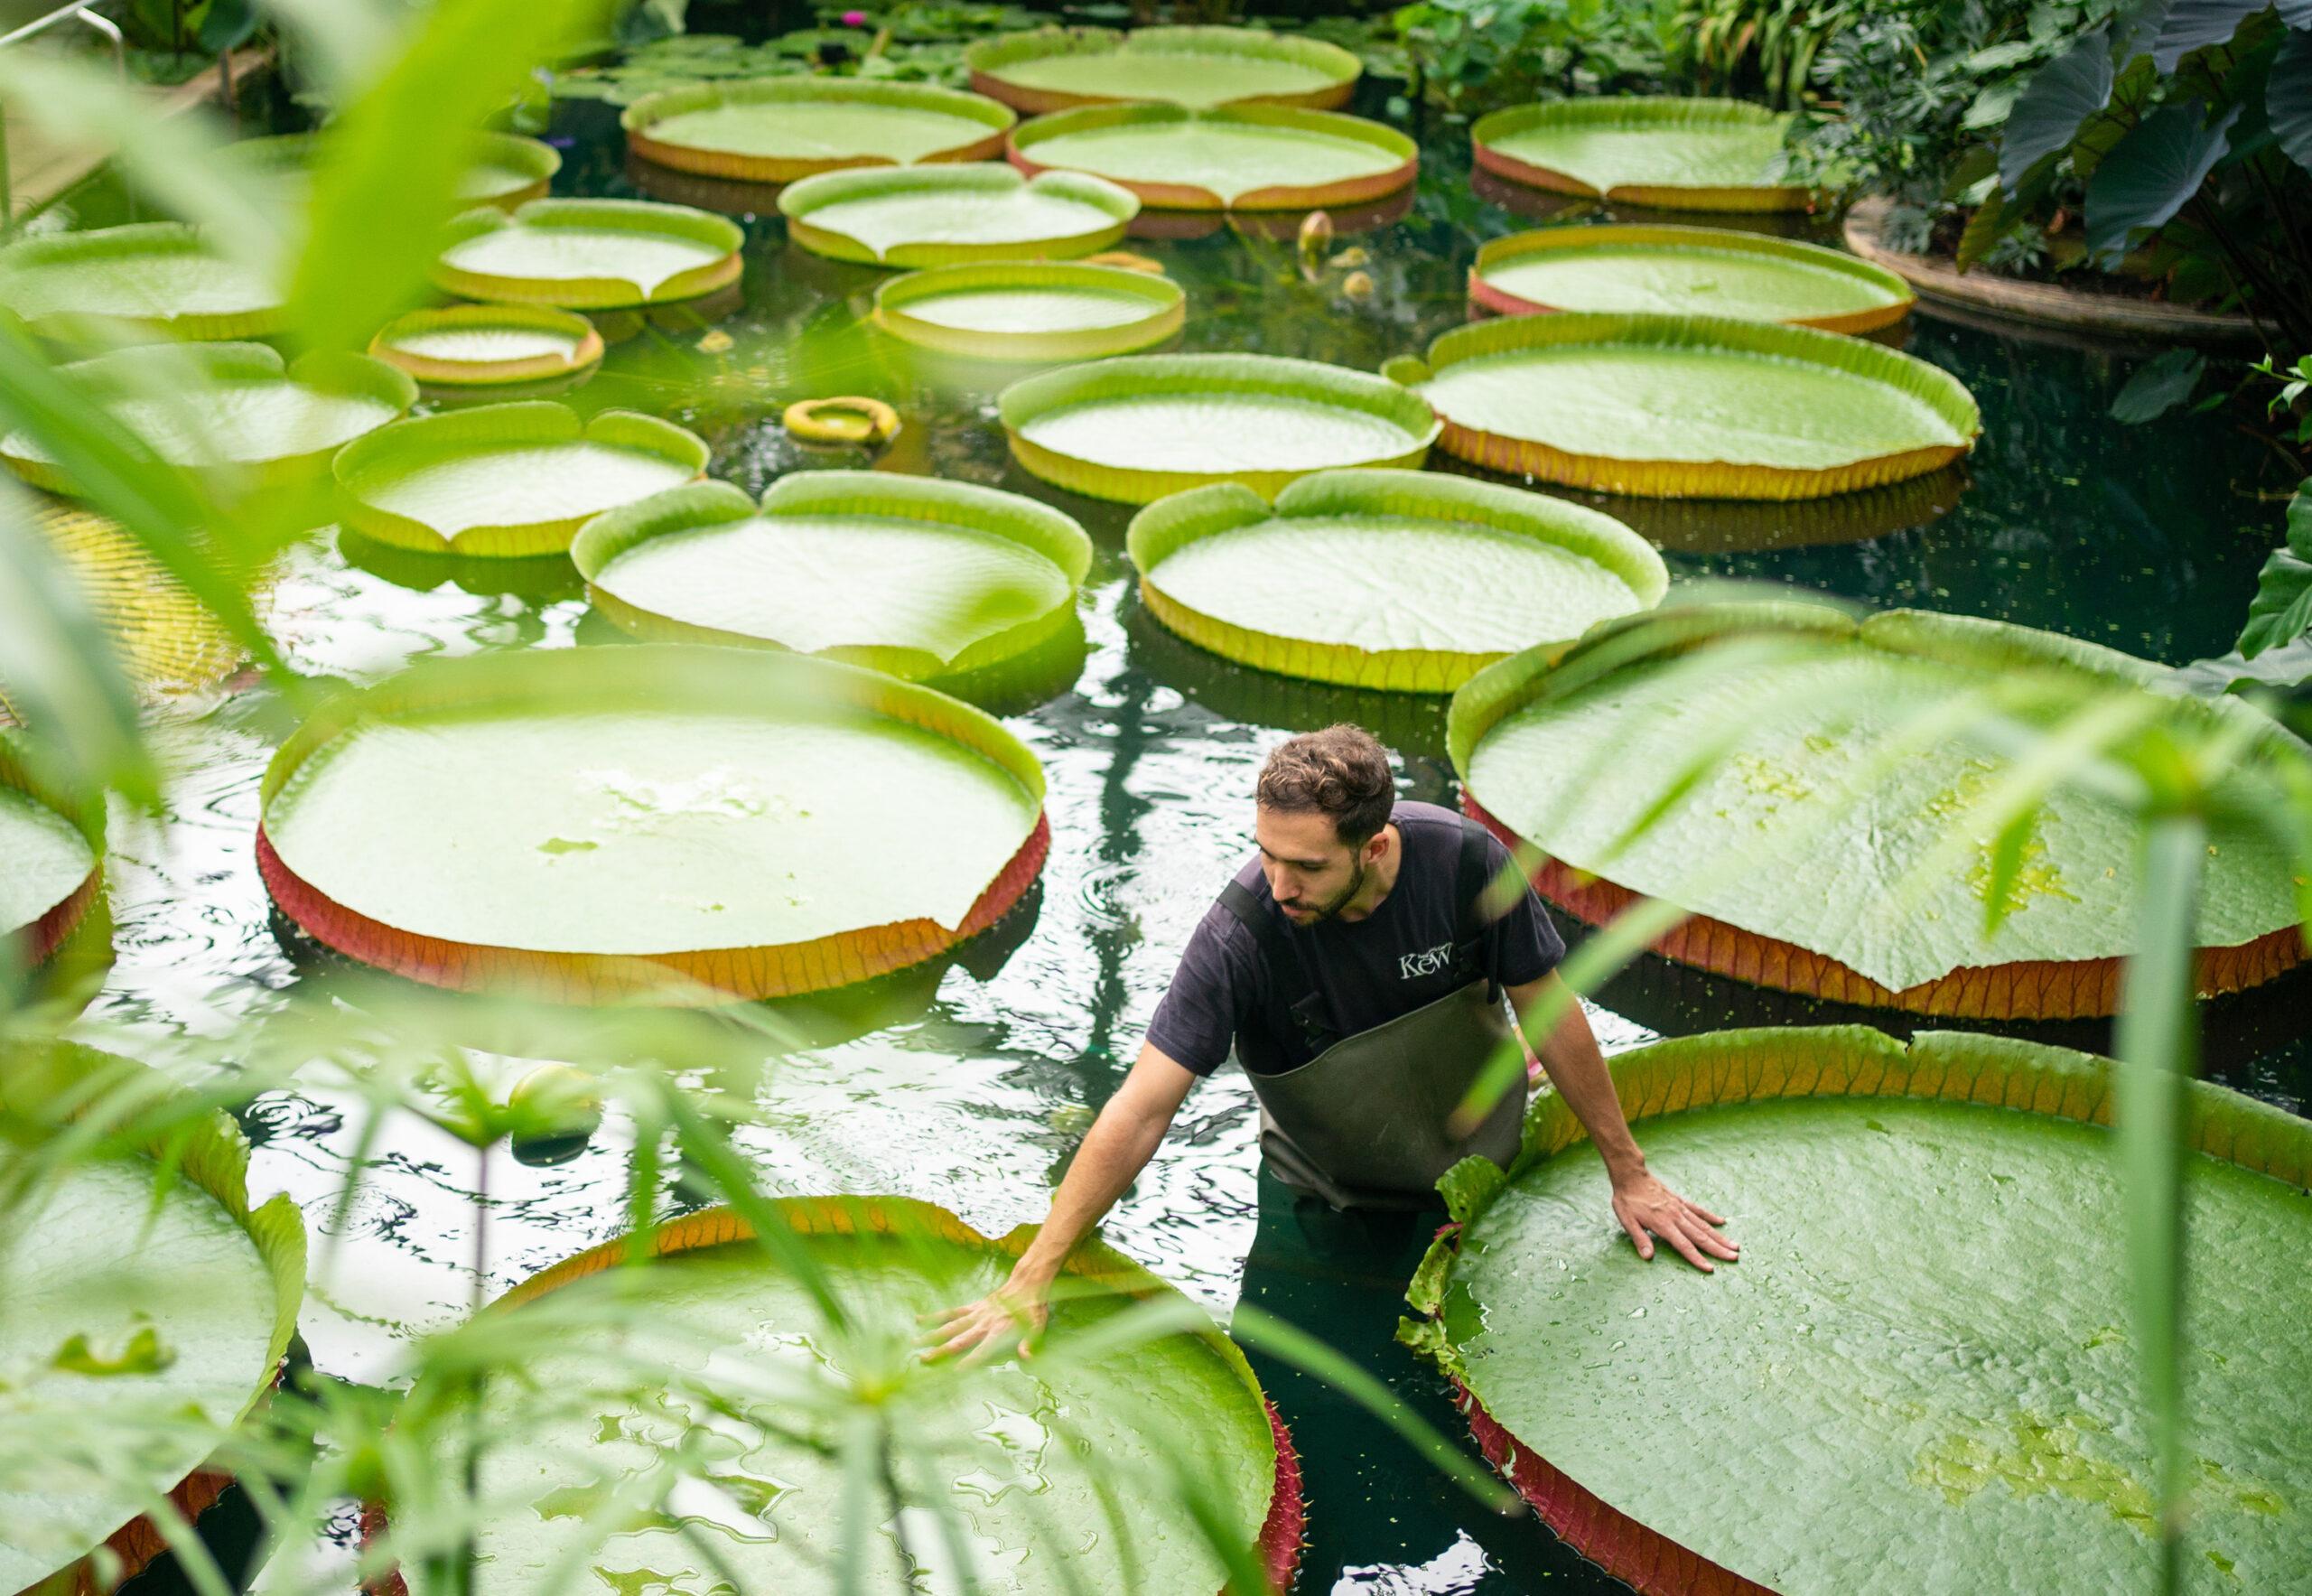 kew gardens guinness world record